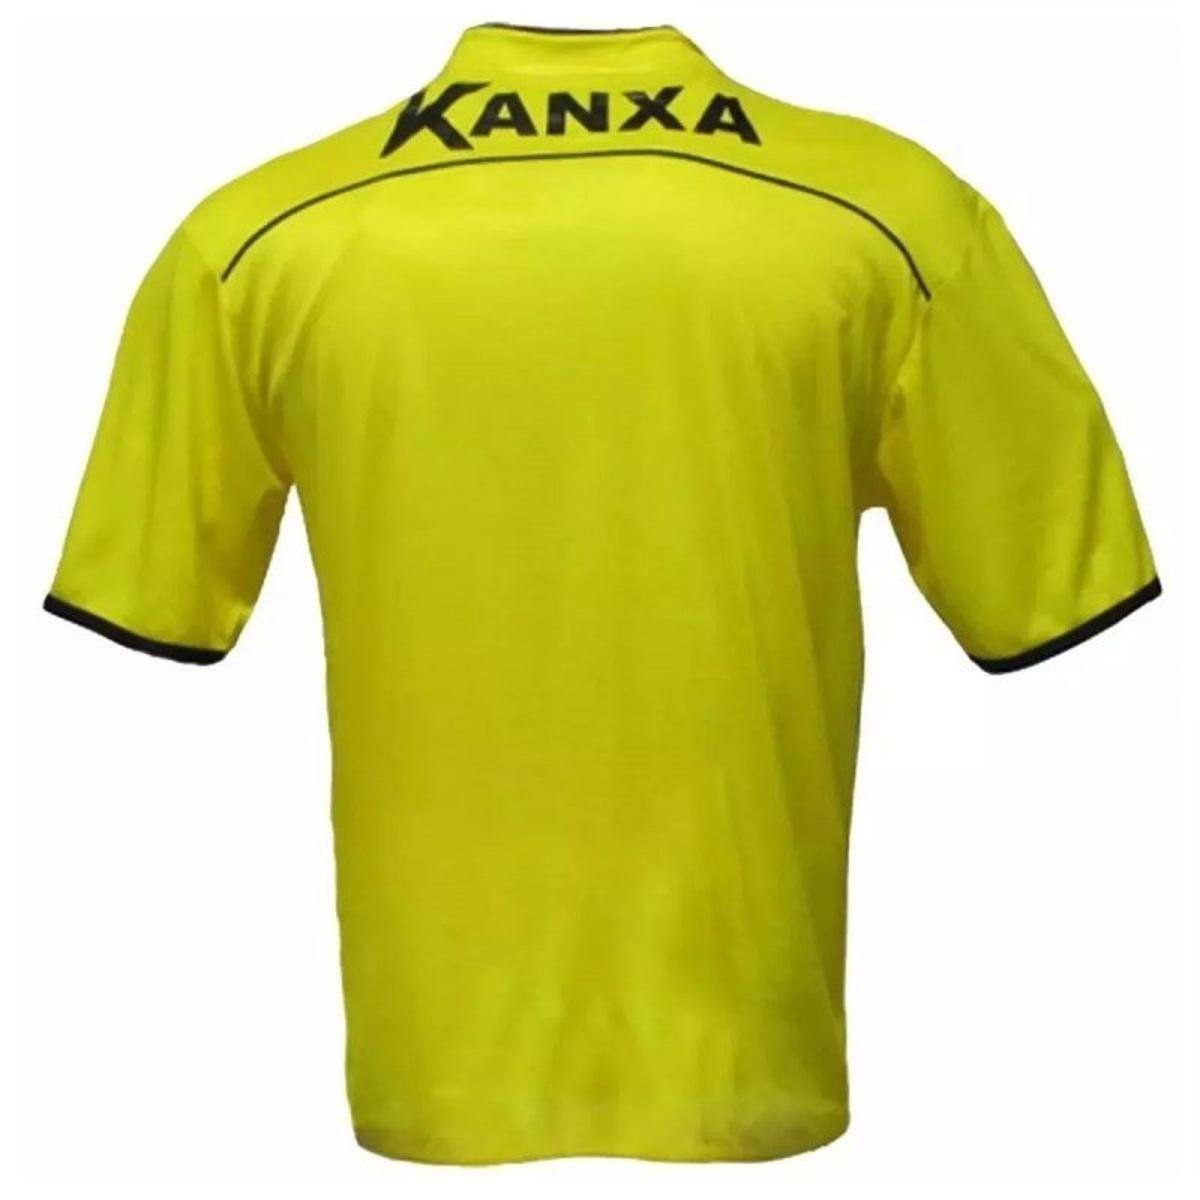 Camisa para Árbitro Kanxa Amarelo